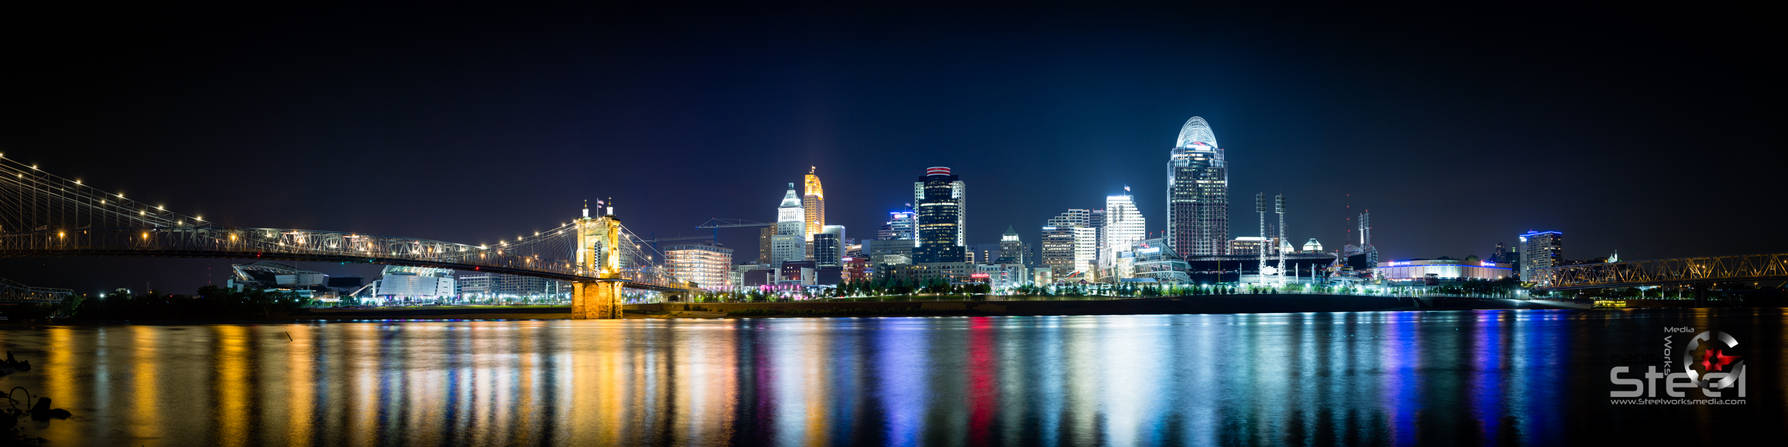 Cincinnati from the water front